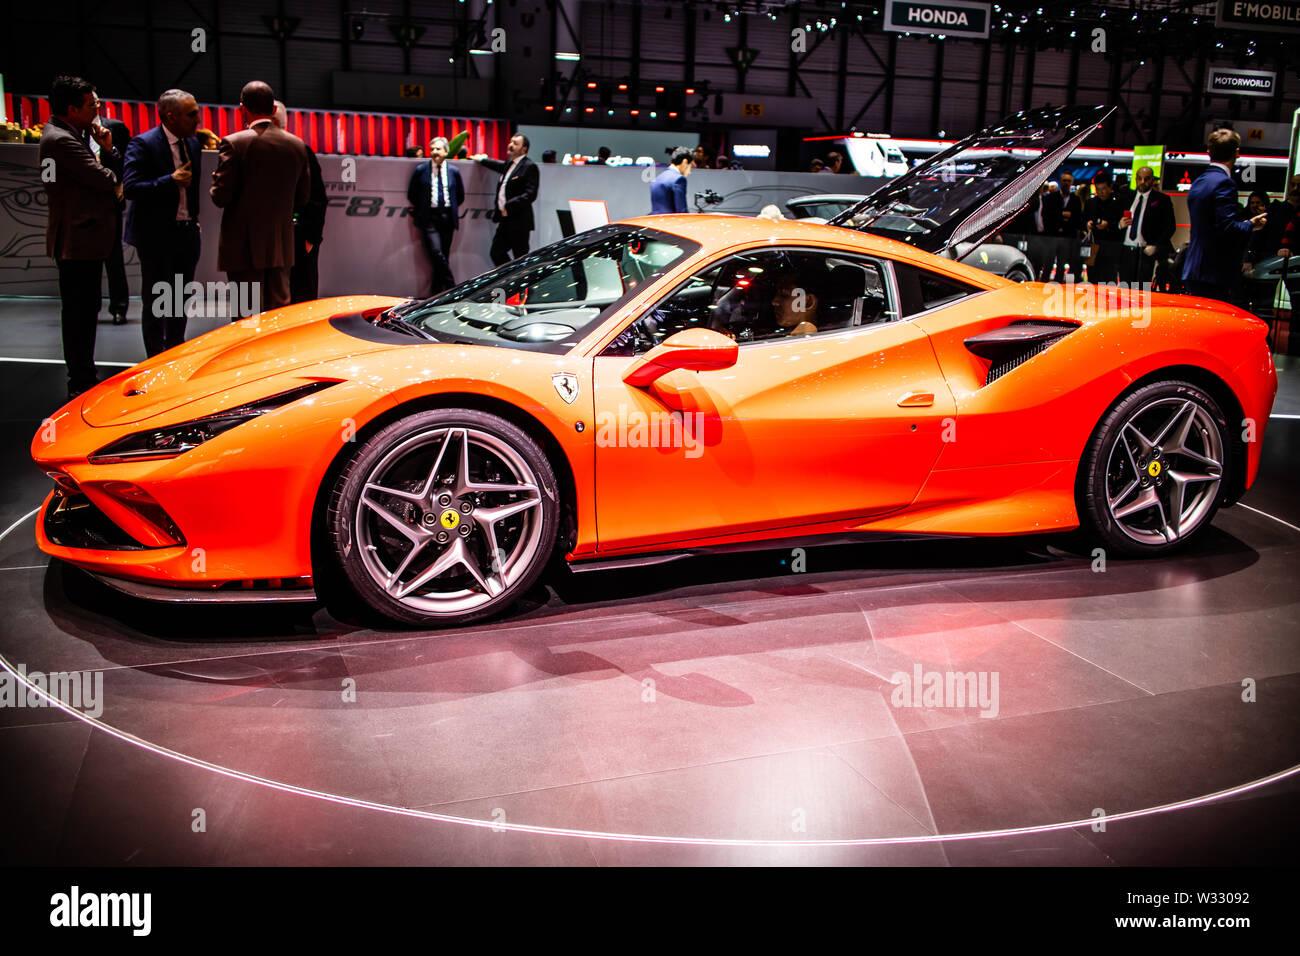 Geneva, Switzerland, March 2019: Ferrari F8 Tributo at Geneva International Motor Show, mid-engined sports car produced by Italian Ferrari - Stock Image